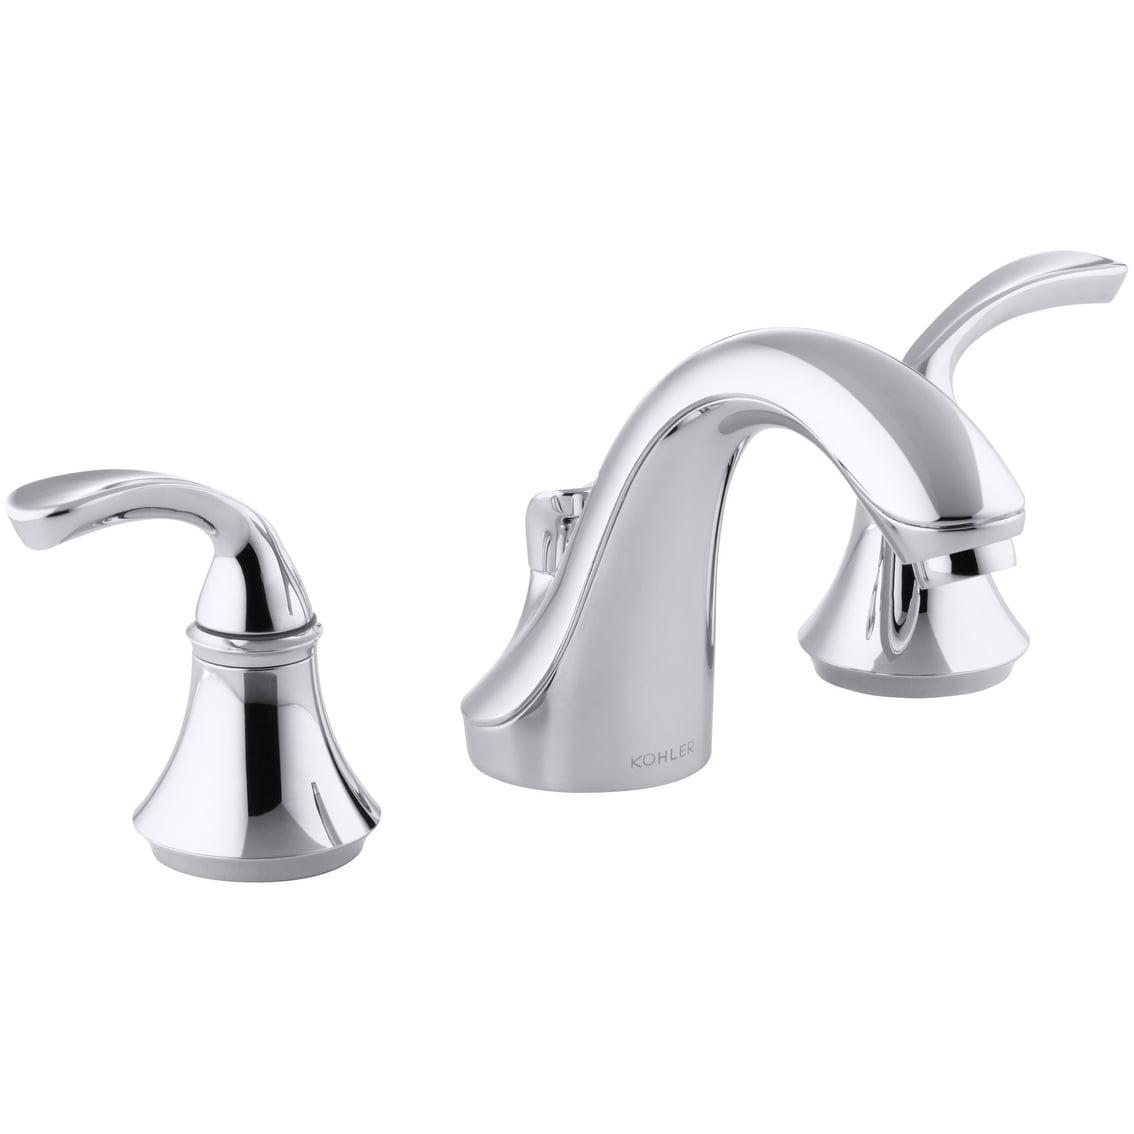 Kohler K 10269 4 Forte Widespread Bathroom Faucet With Ultra Glide Polished Chrome Overstock 27085253